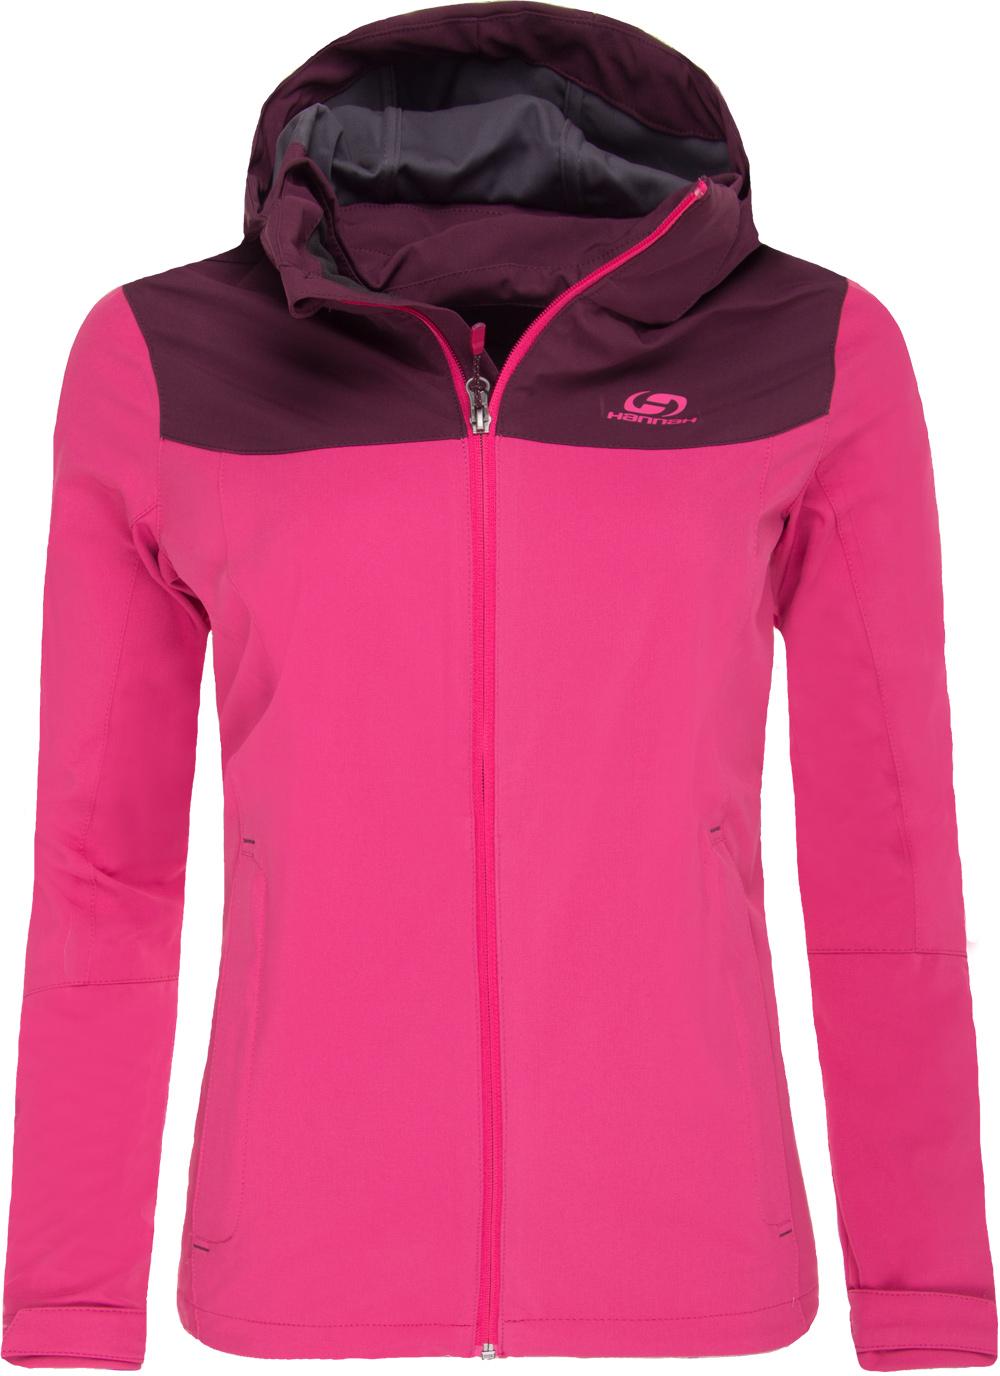 Women's softshell jacket HANNAH Ganni Lite